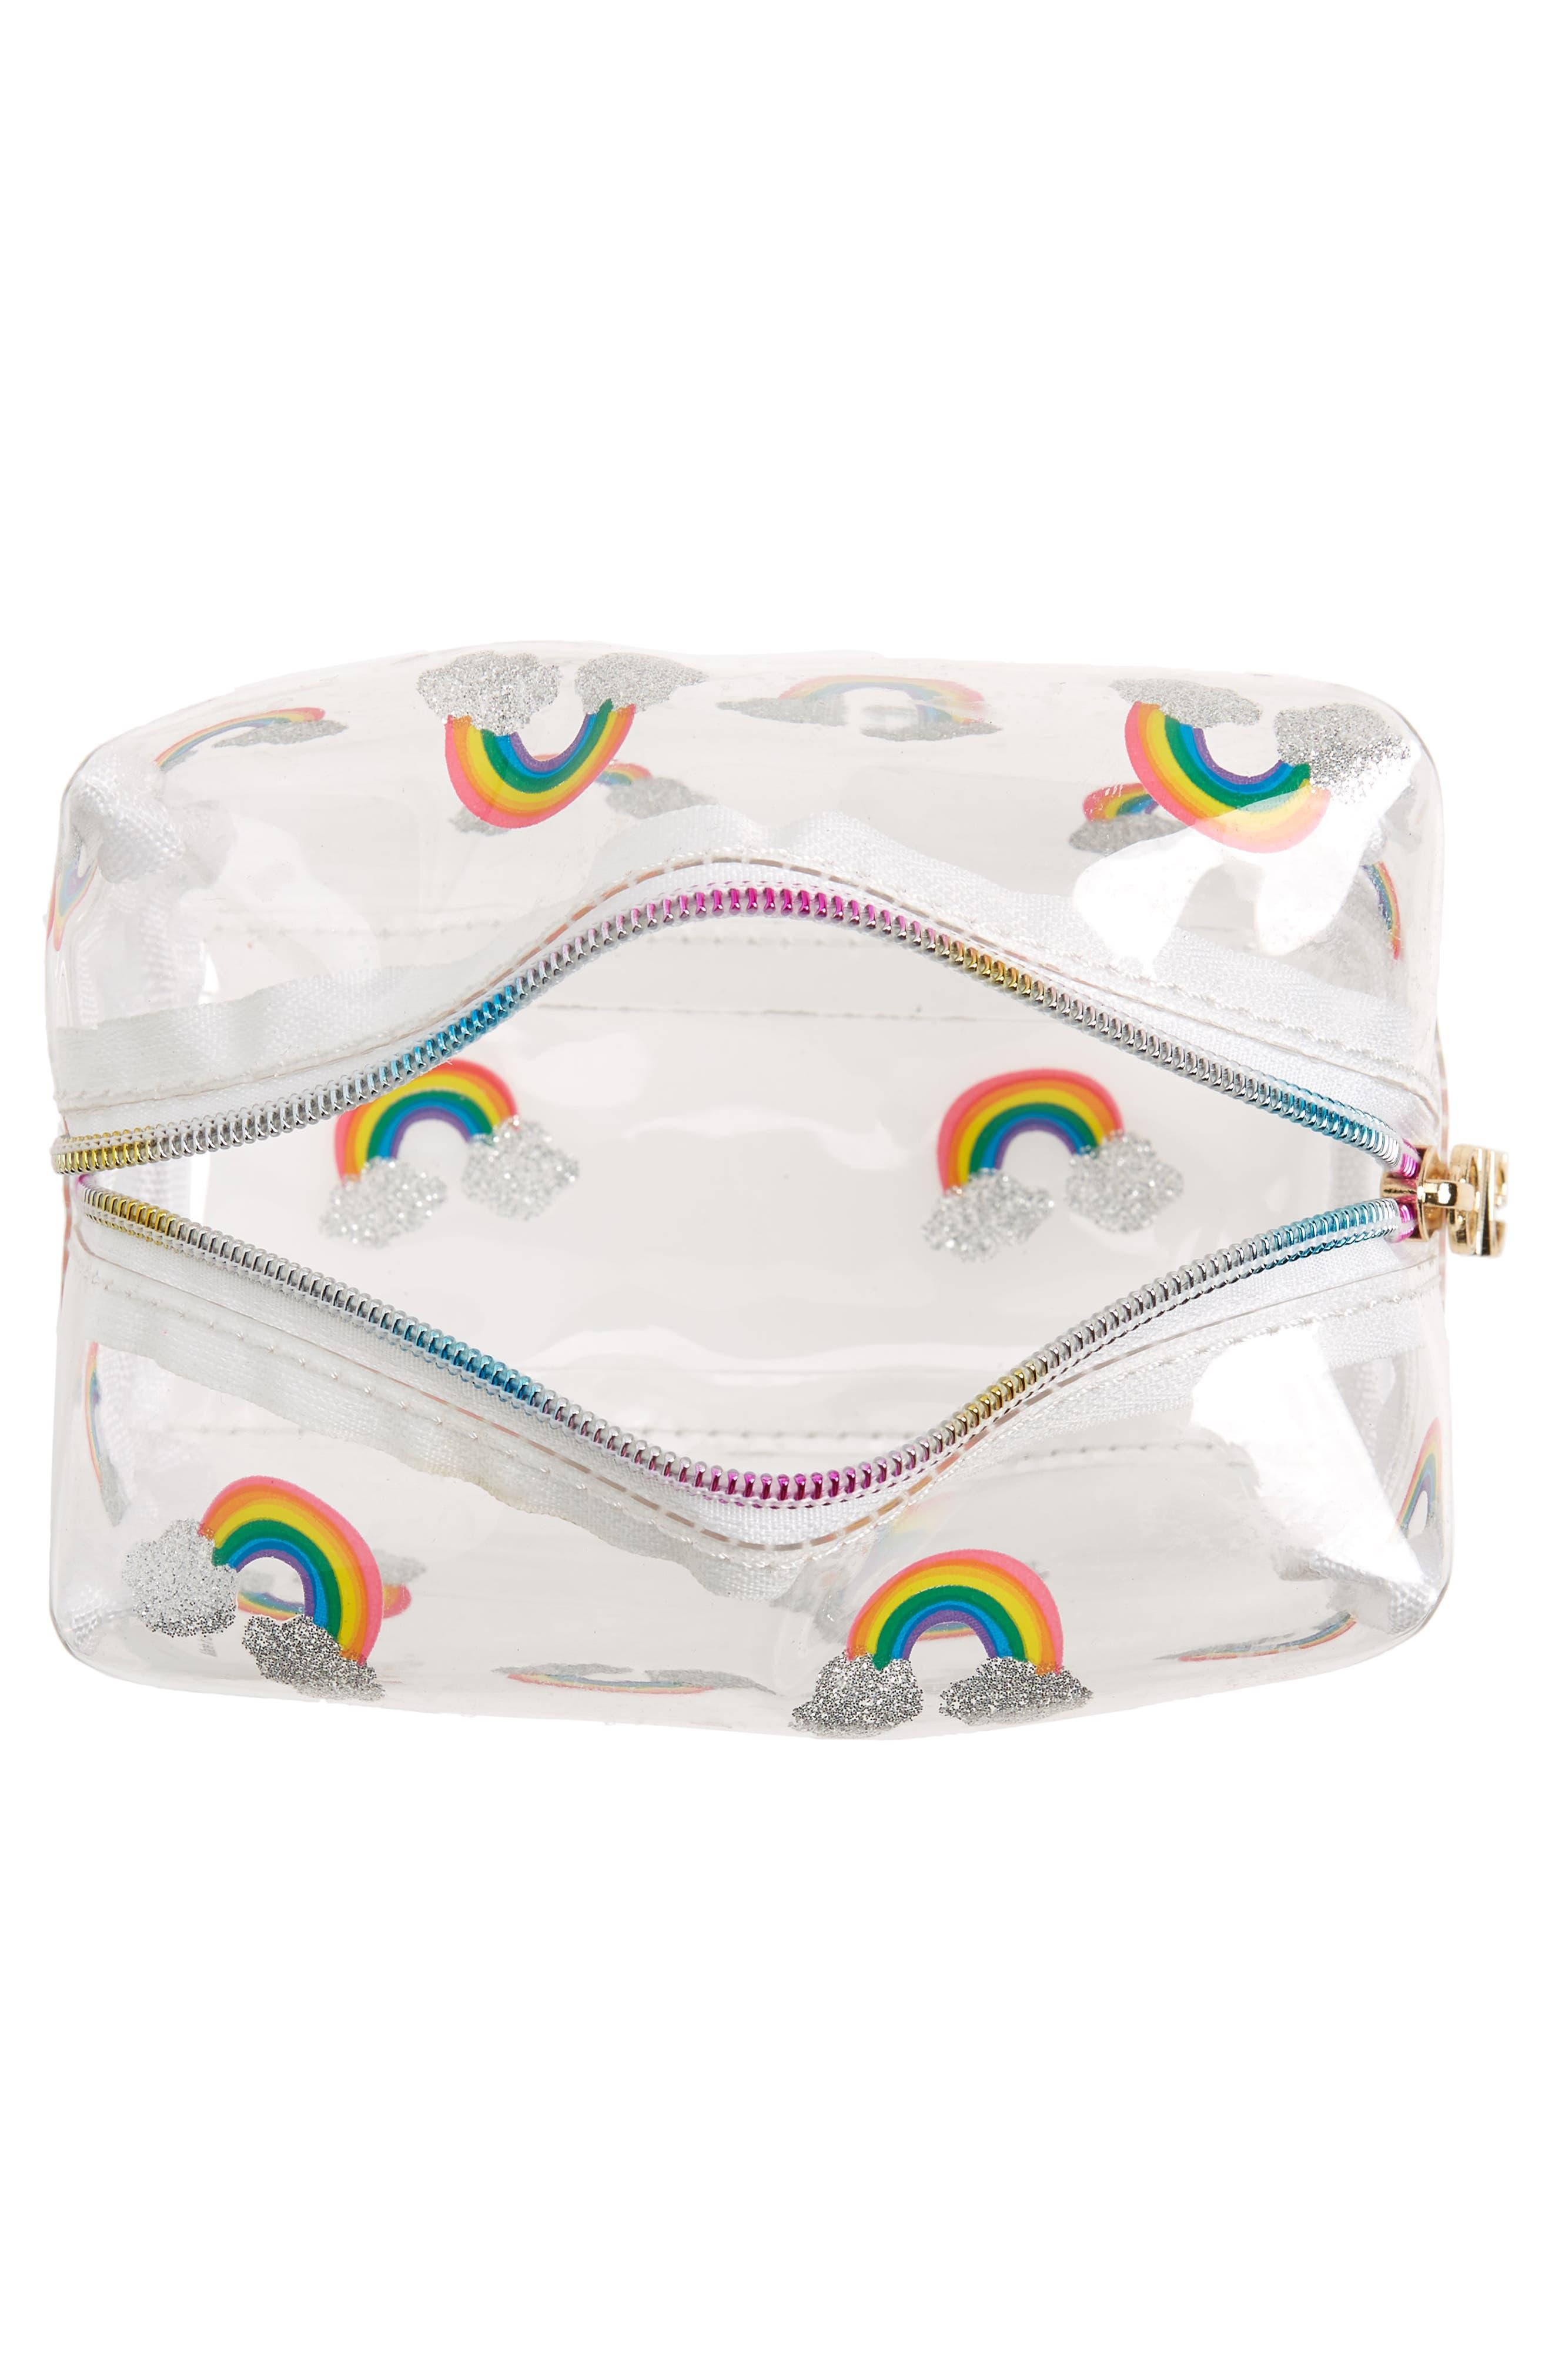 Rainbow Cosmetics Bag,                             Alternate thumbnail 3, color,                             100